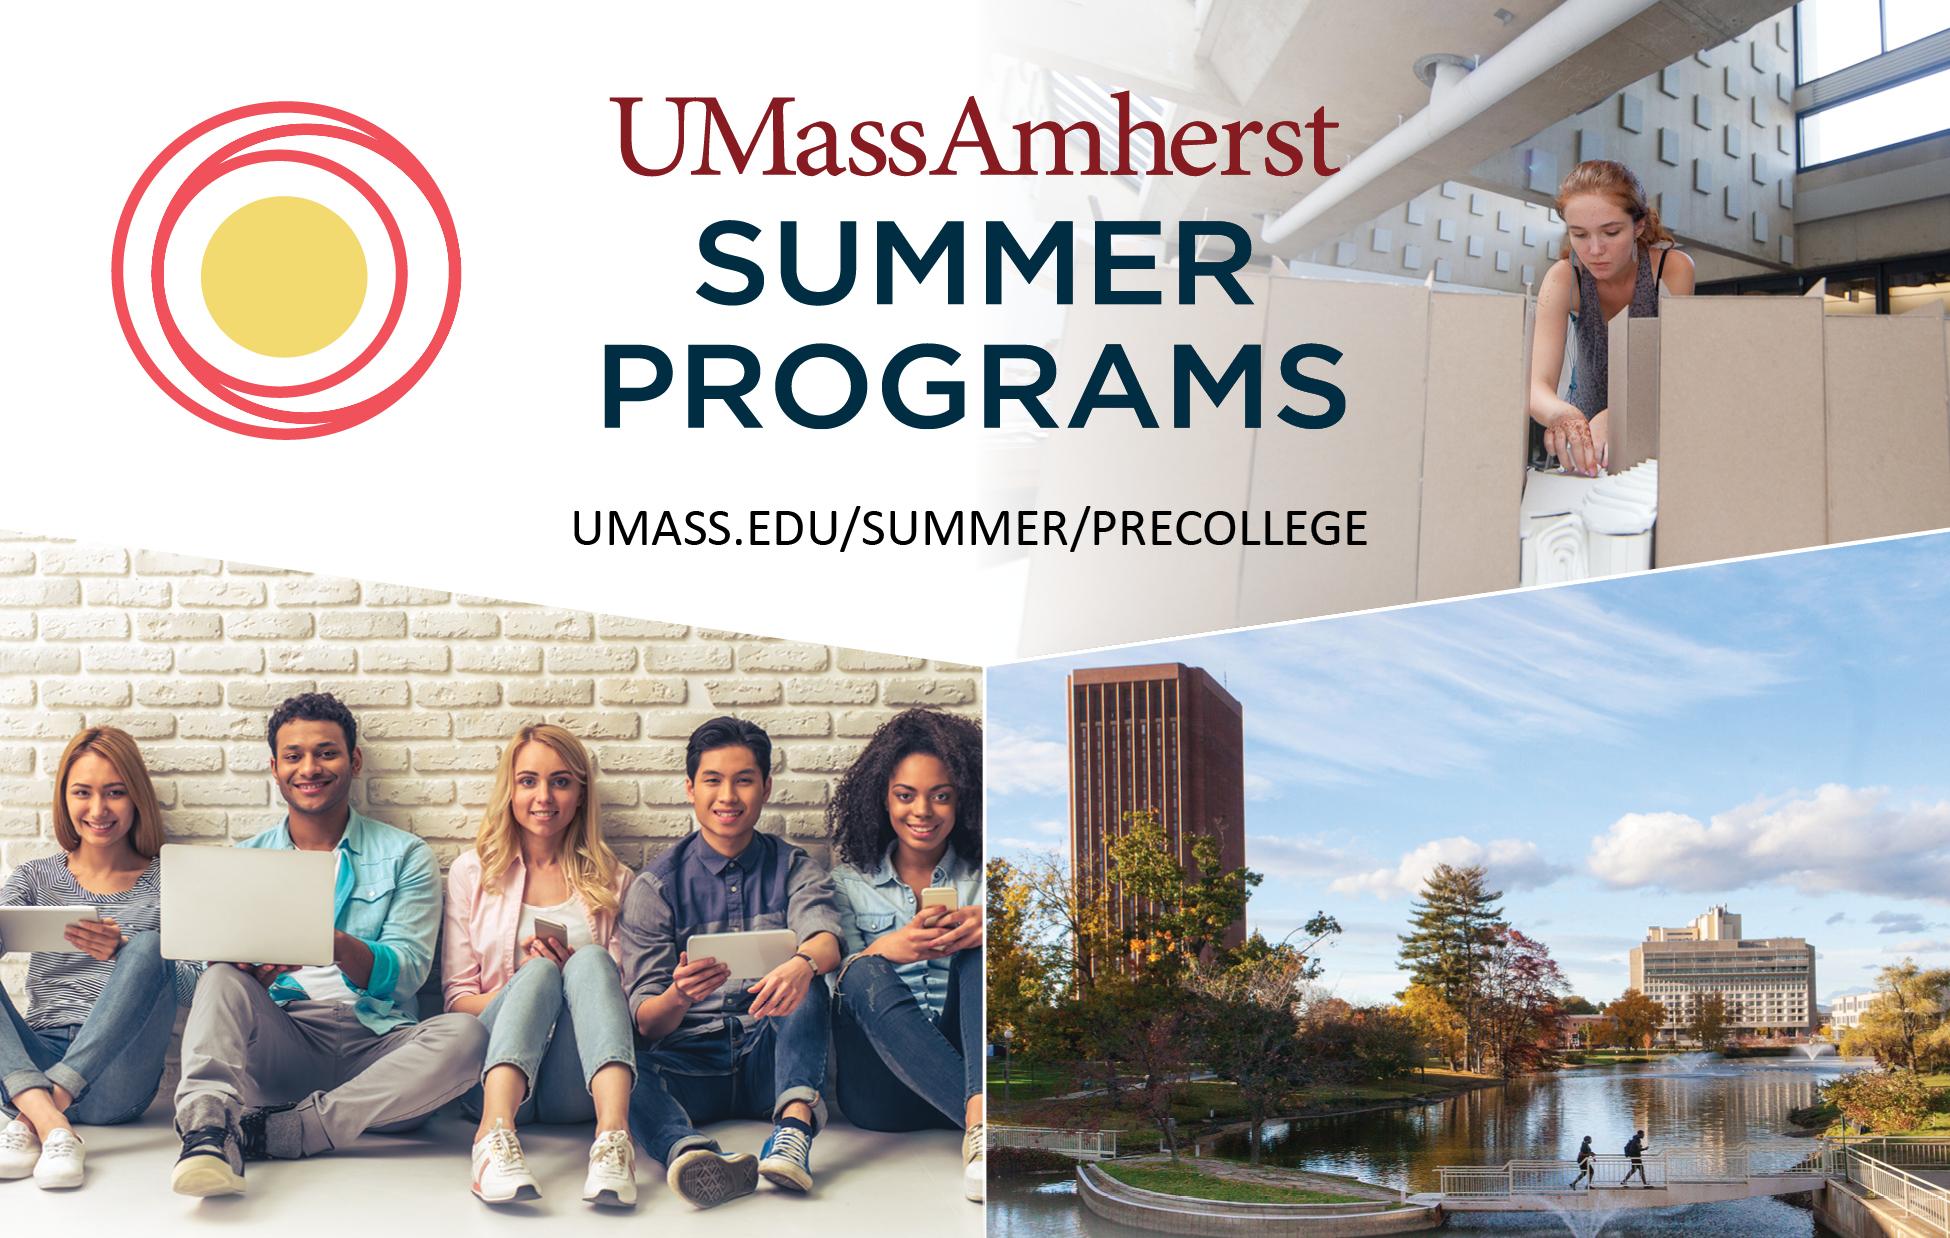 Summer Program - College Experience | UMass Amherst Summer Pre-College Programs